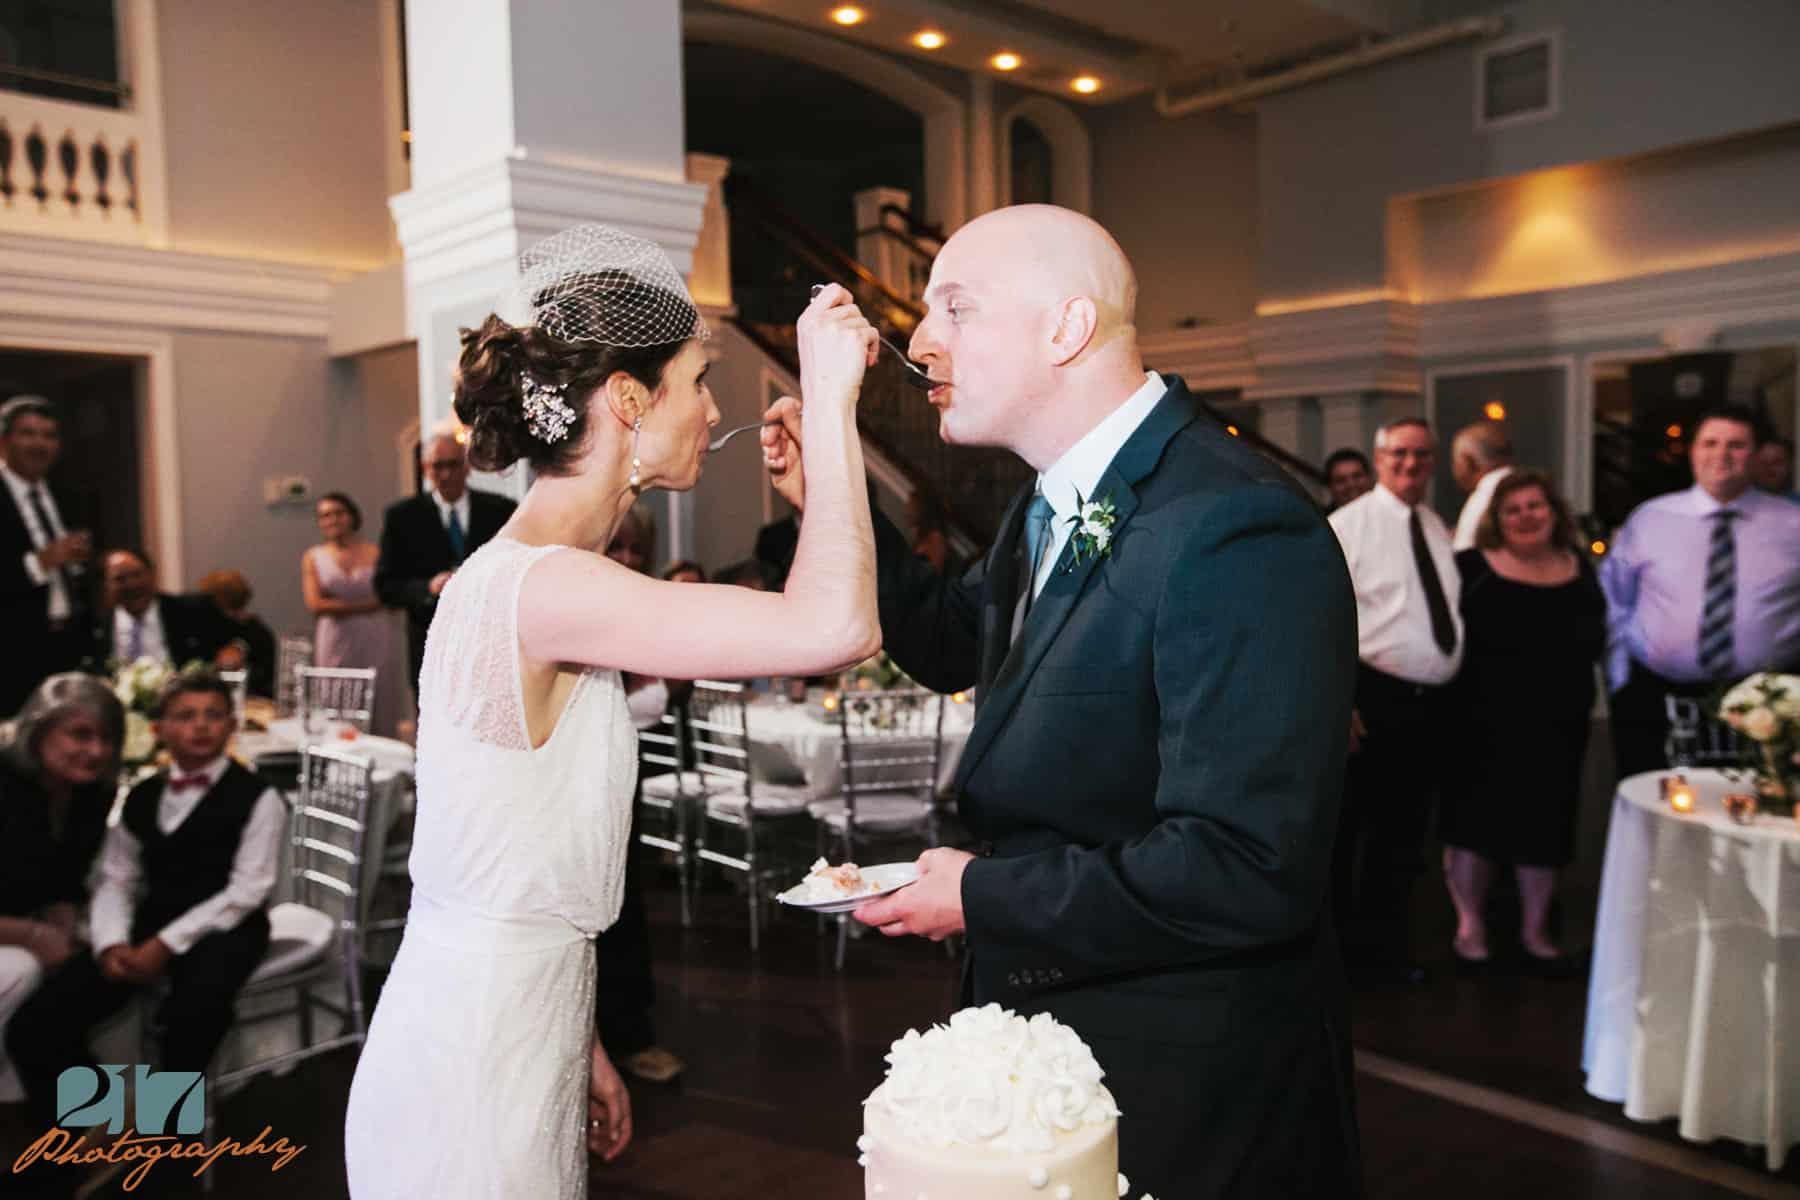 Cake cutting wedding photo